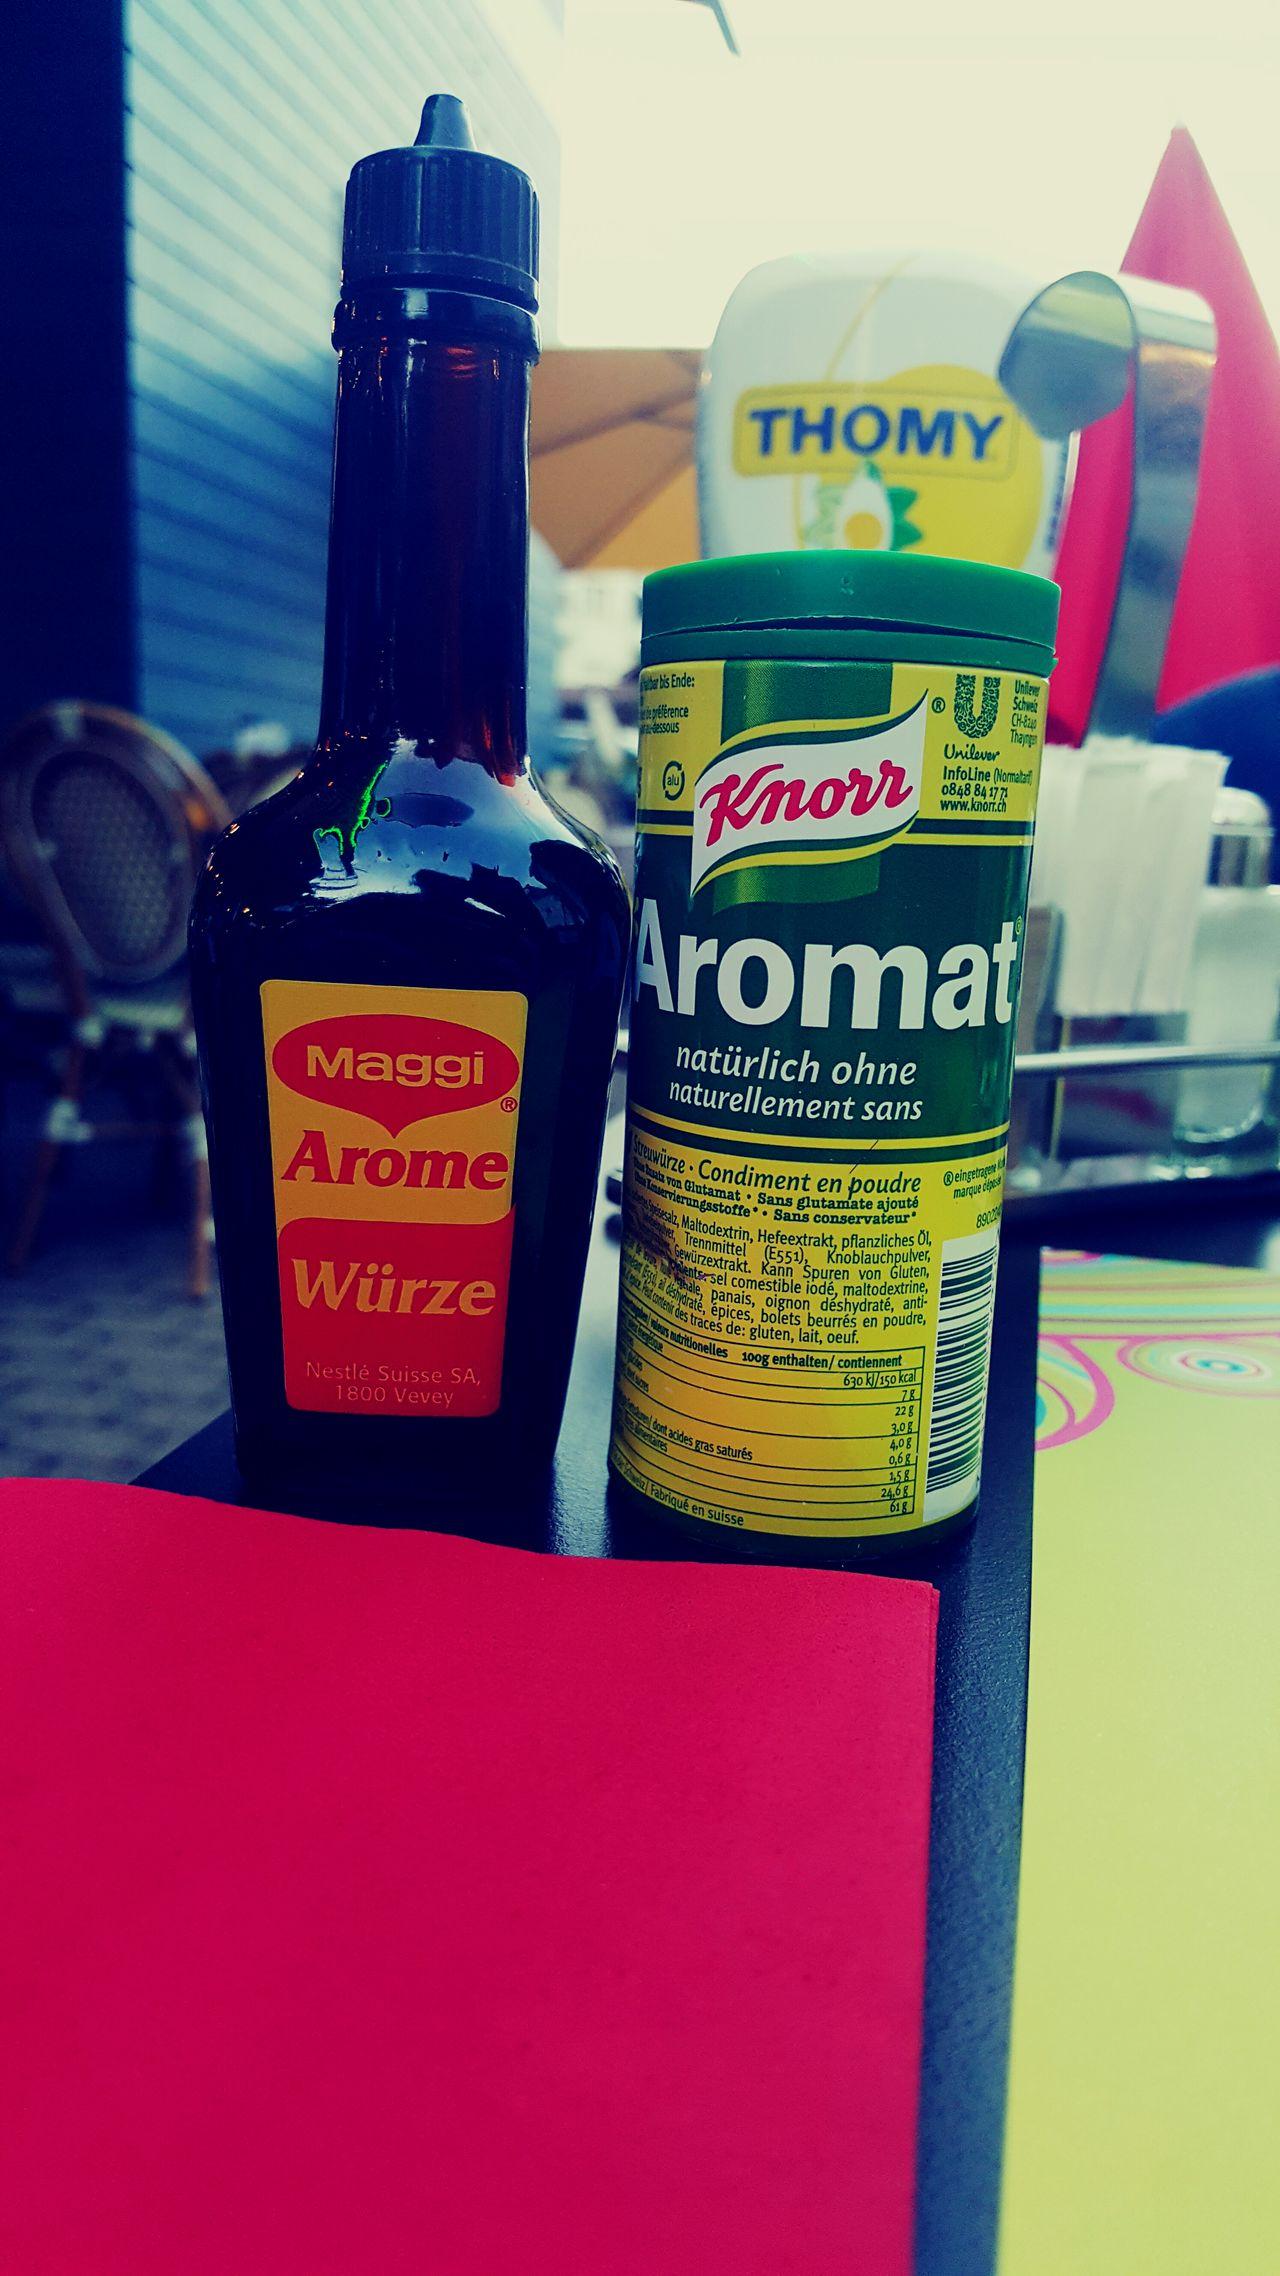 Aromat Maggi Knorr Vintage Sauce Thomy Oldschool Swiss Food Branding